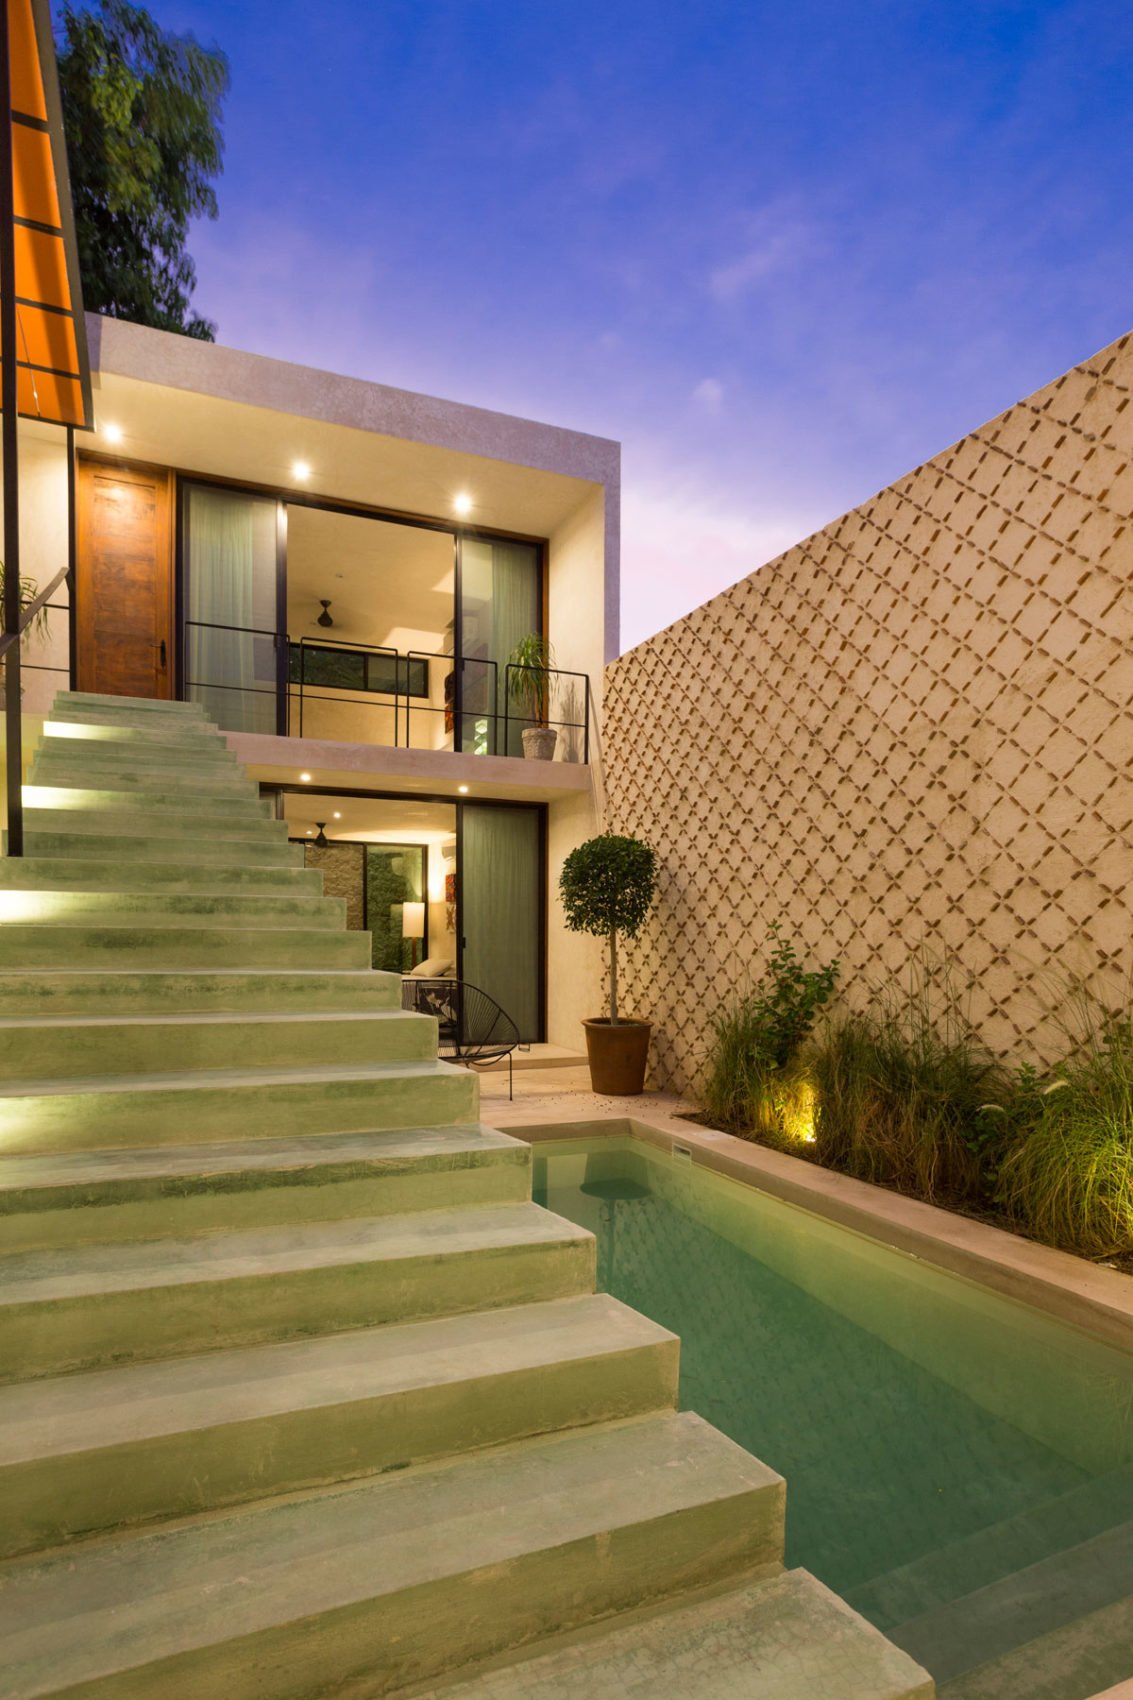 Casa del Limonero by Taller Estilo Arquitectura (20)